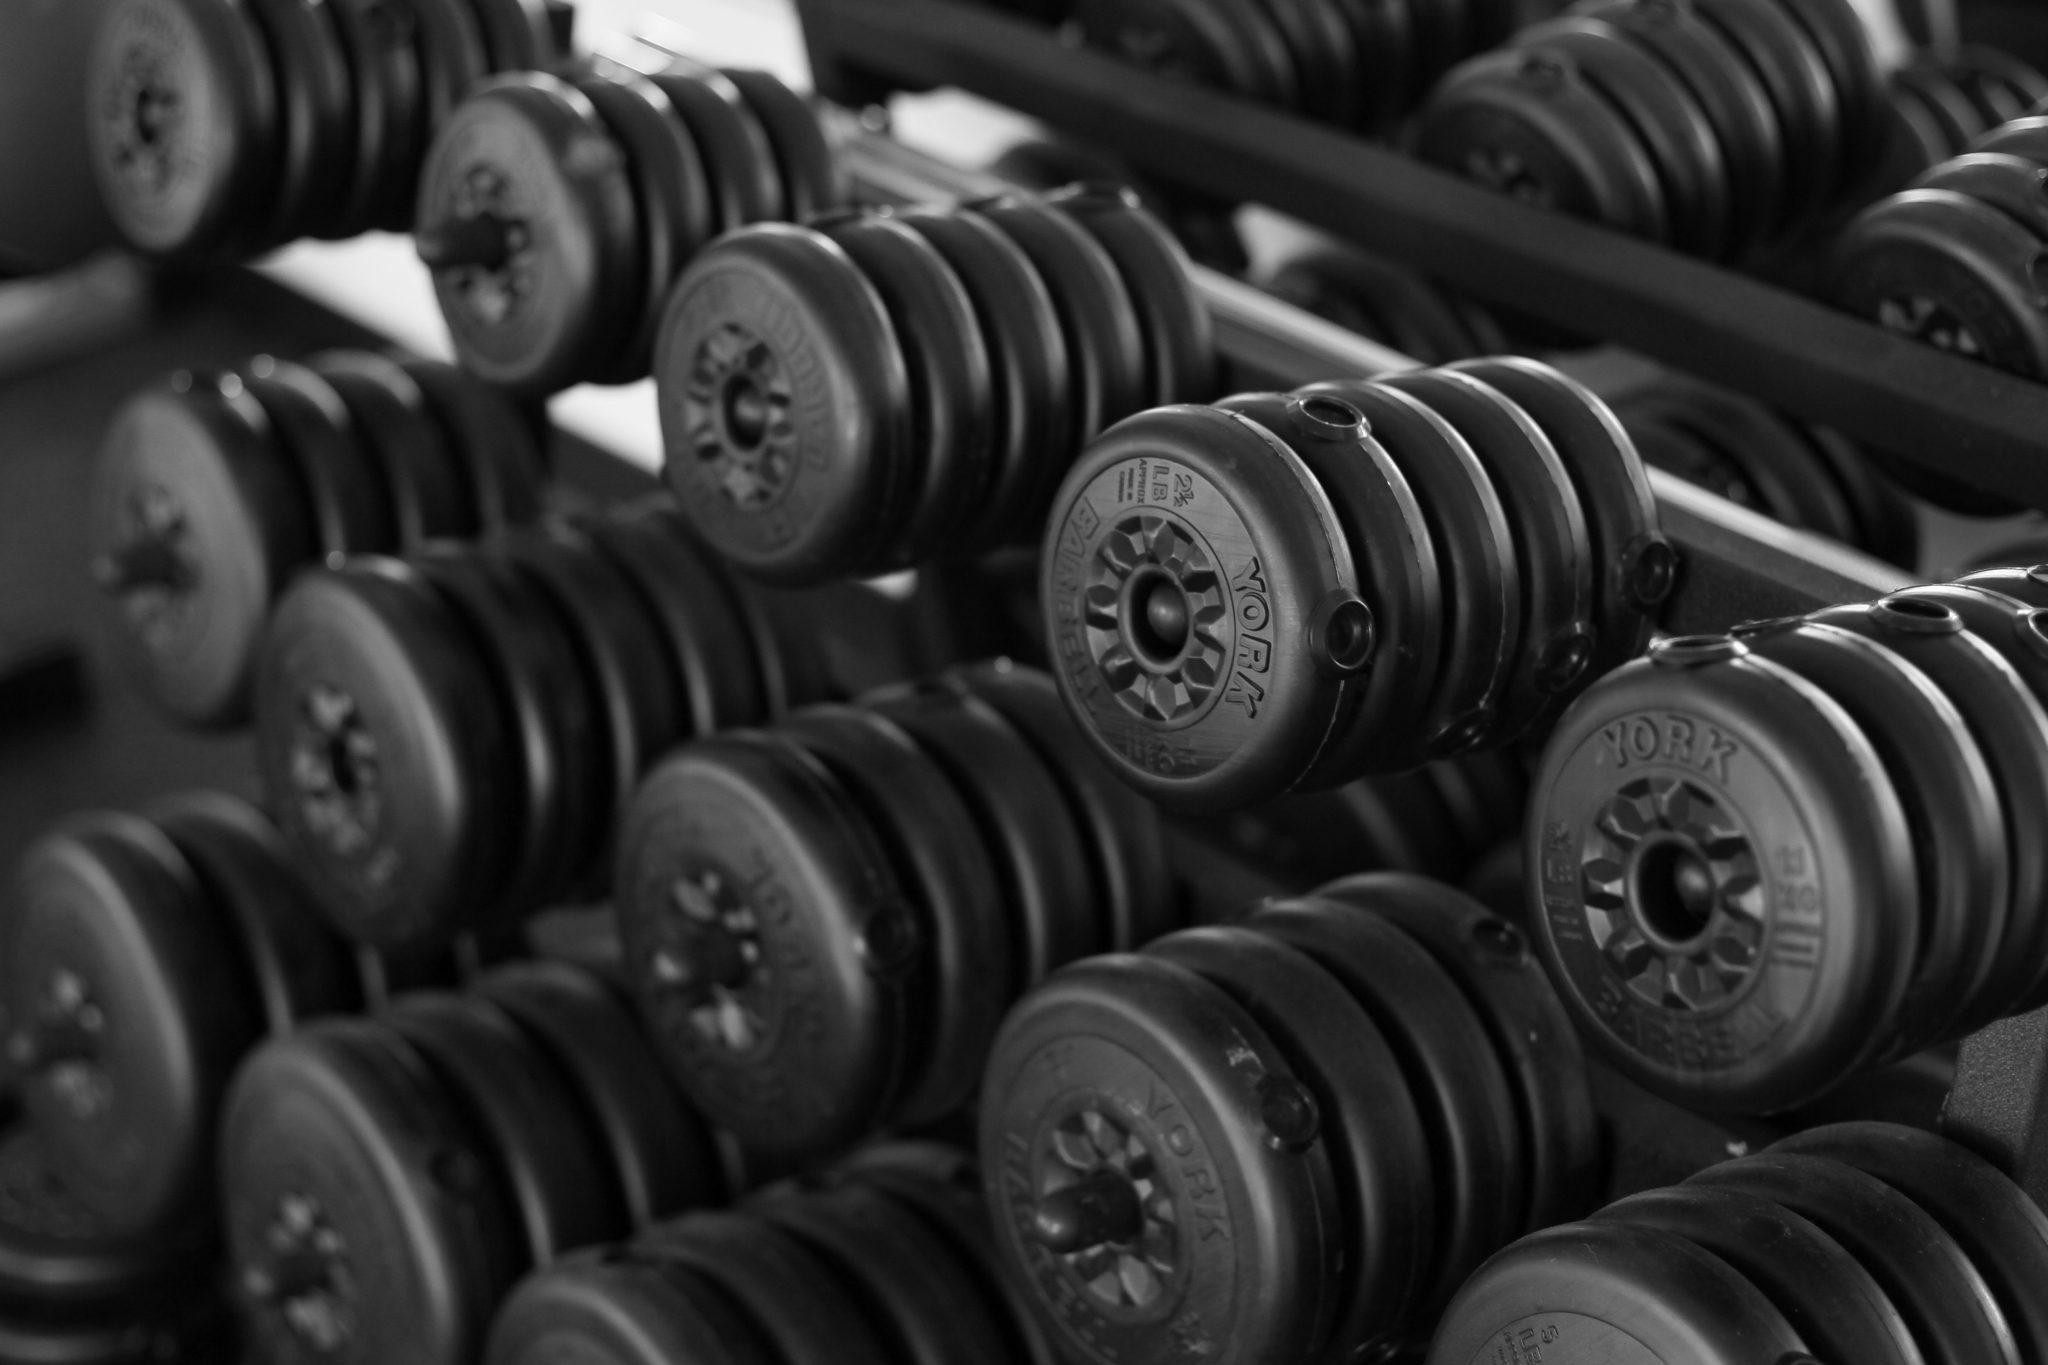 Aerobic Weight Sets & Equipment